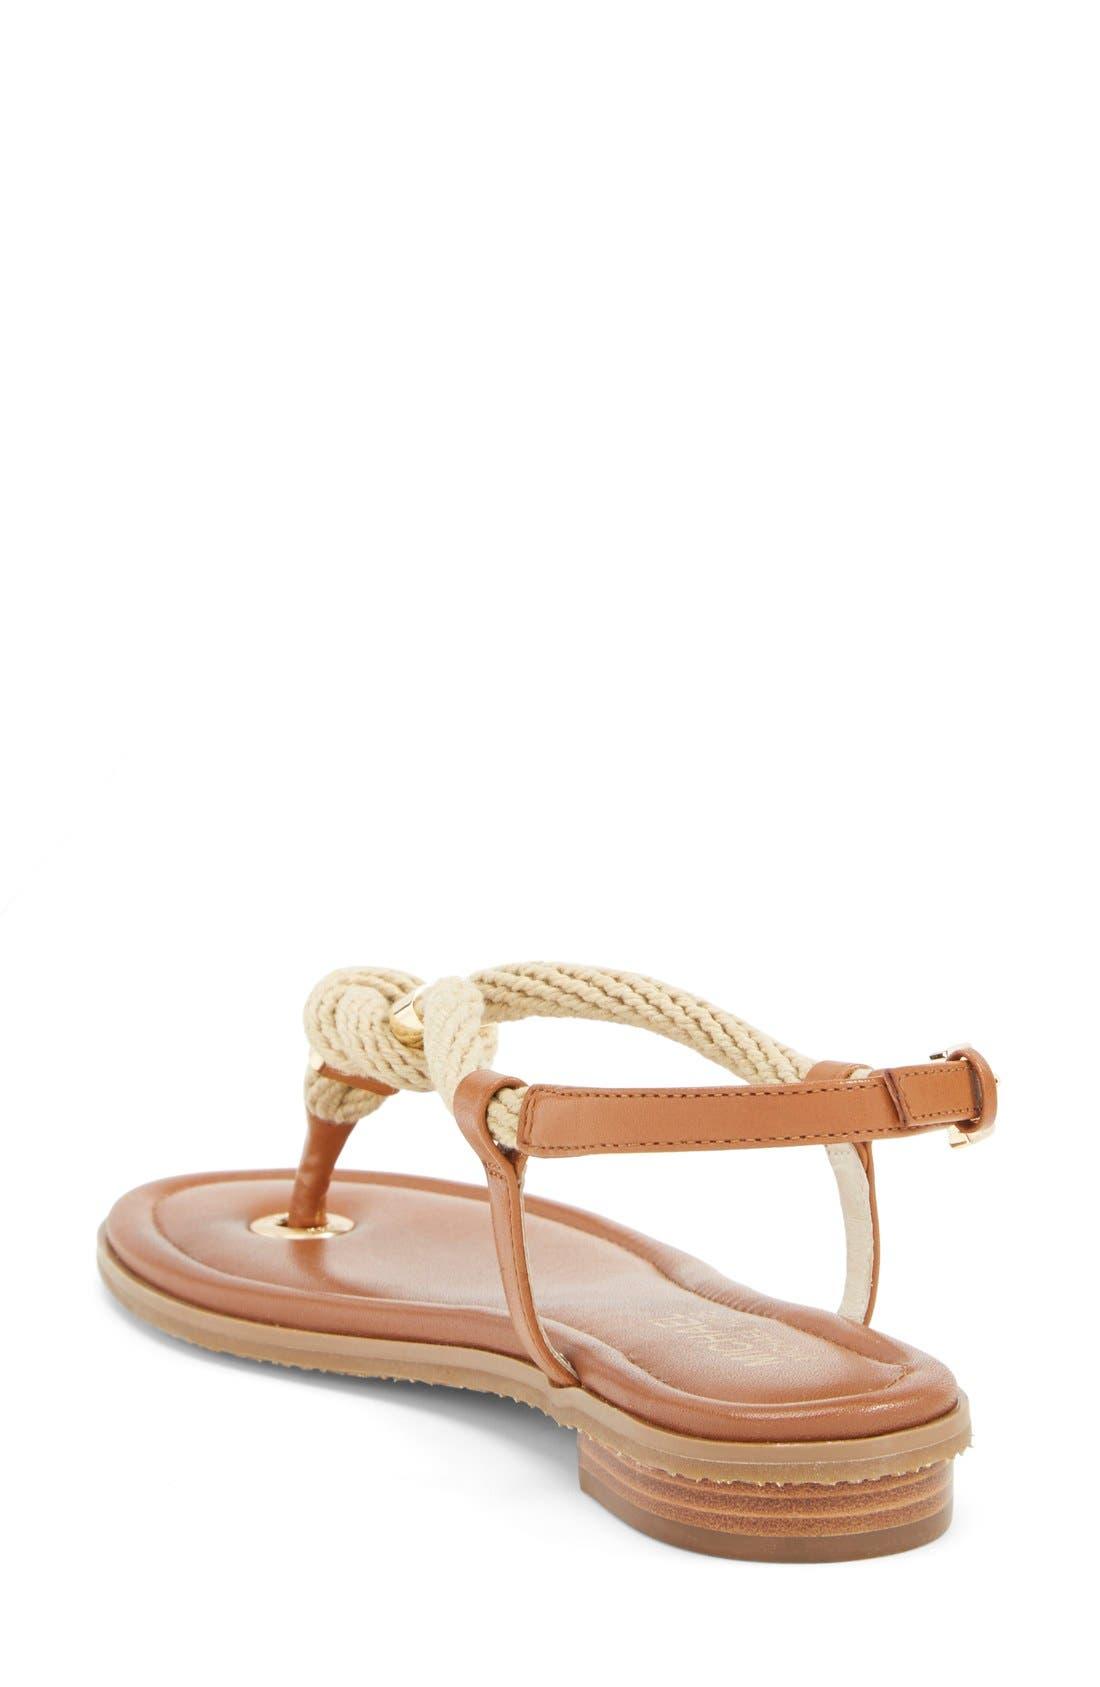 Alternate Image 2  - MICHAEL Michael Kors 'Holly' Leather Thong Sandal (Women)